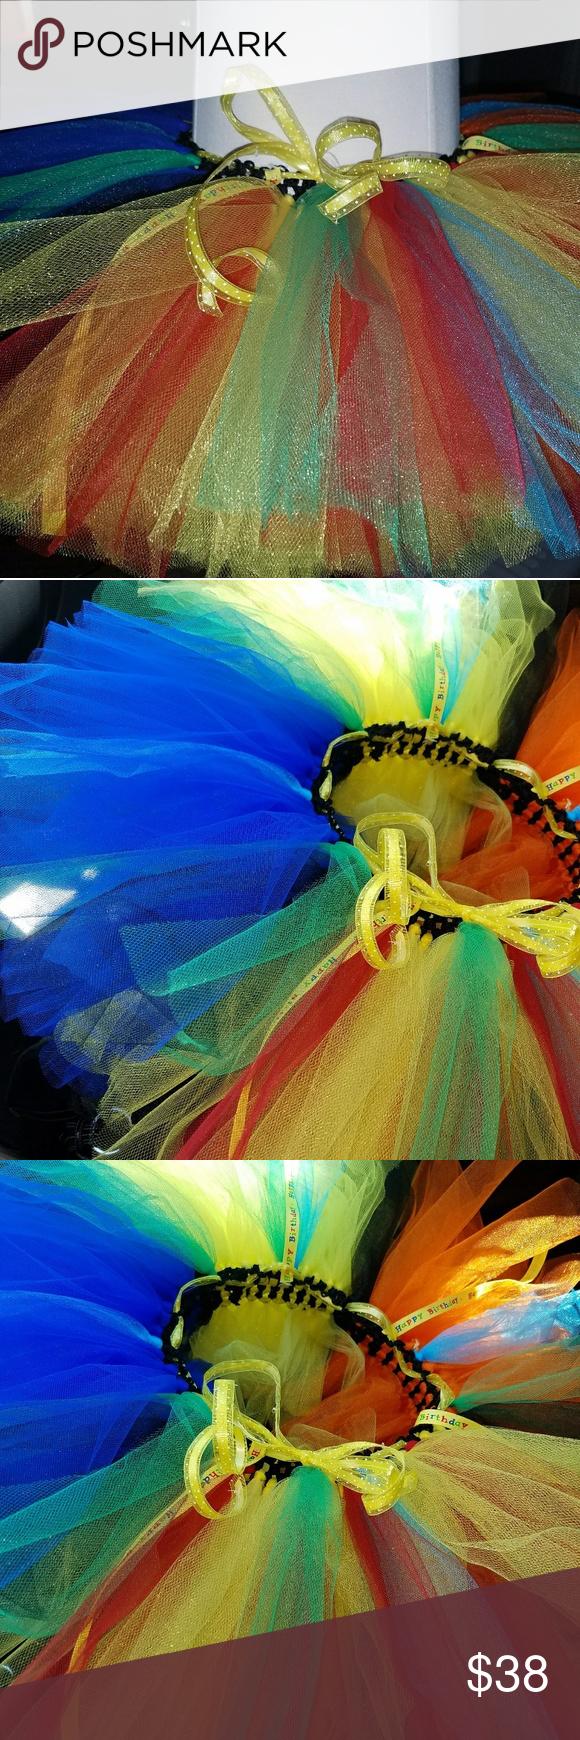 Tutu skirt Emogi colors, colorful tutu, any size Tutu Skirt Blues, yellows,reds and greens. Tiny's Tutus Bottoms Skirts